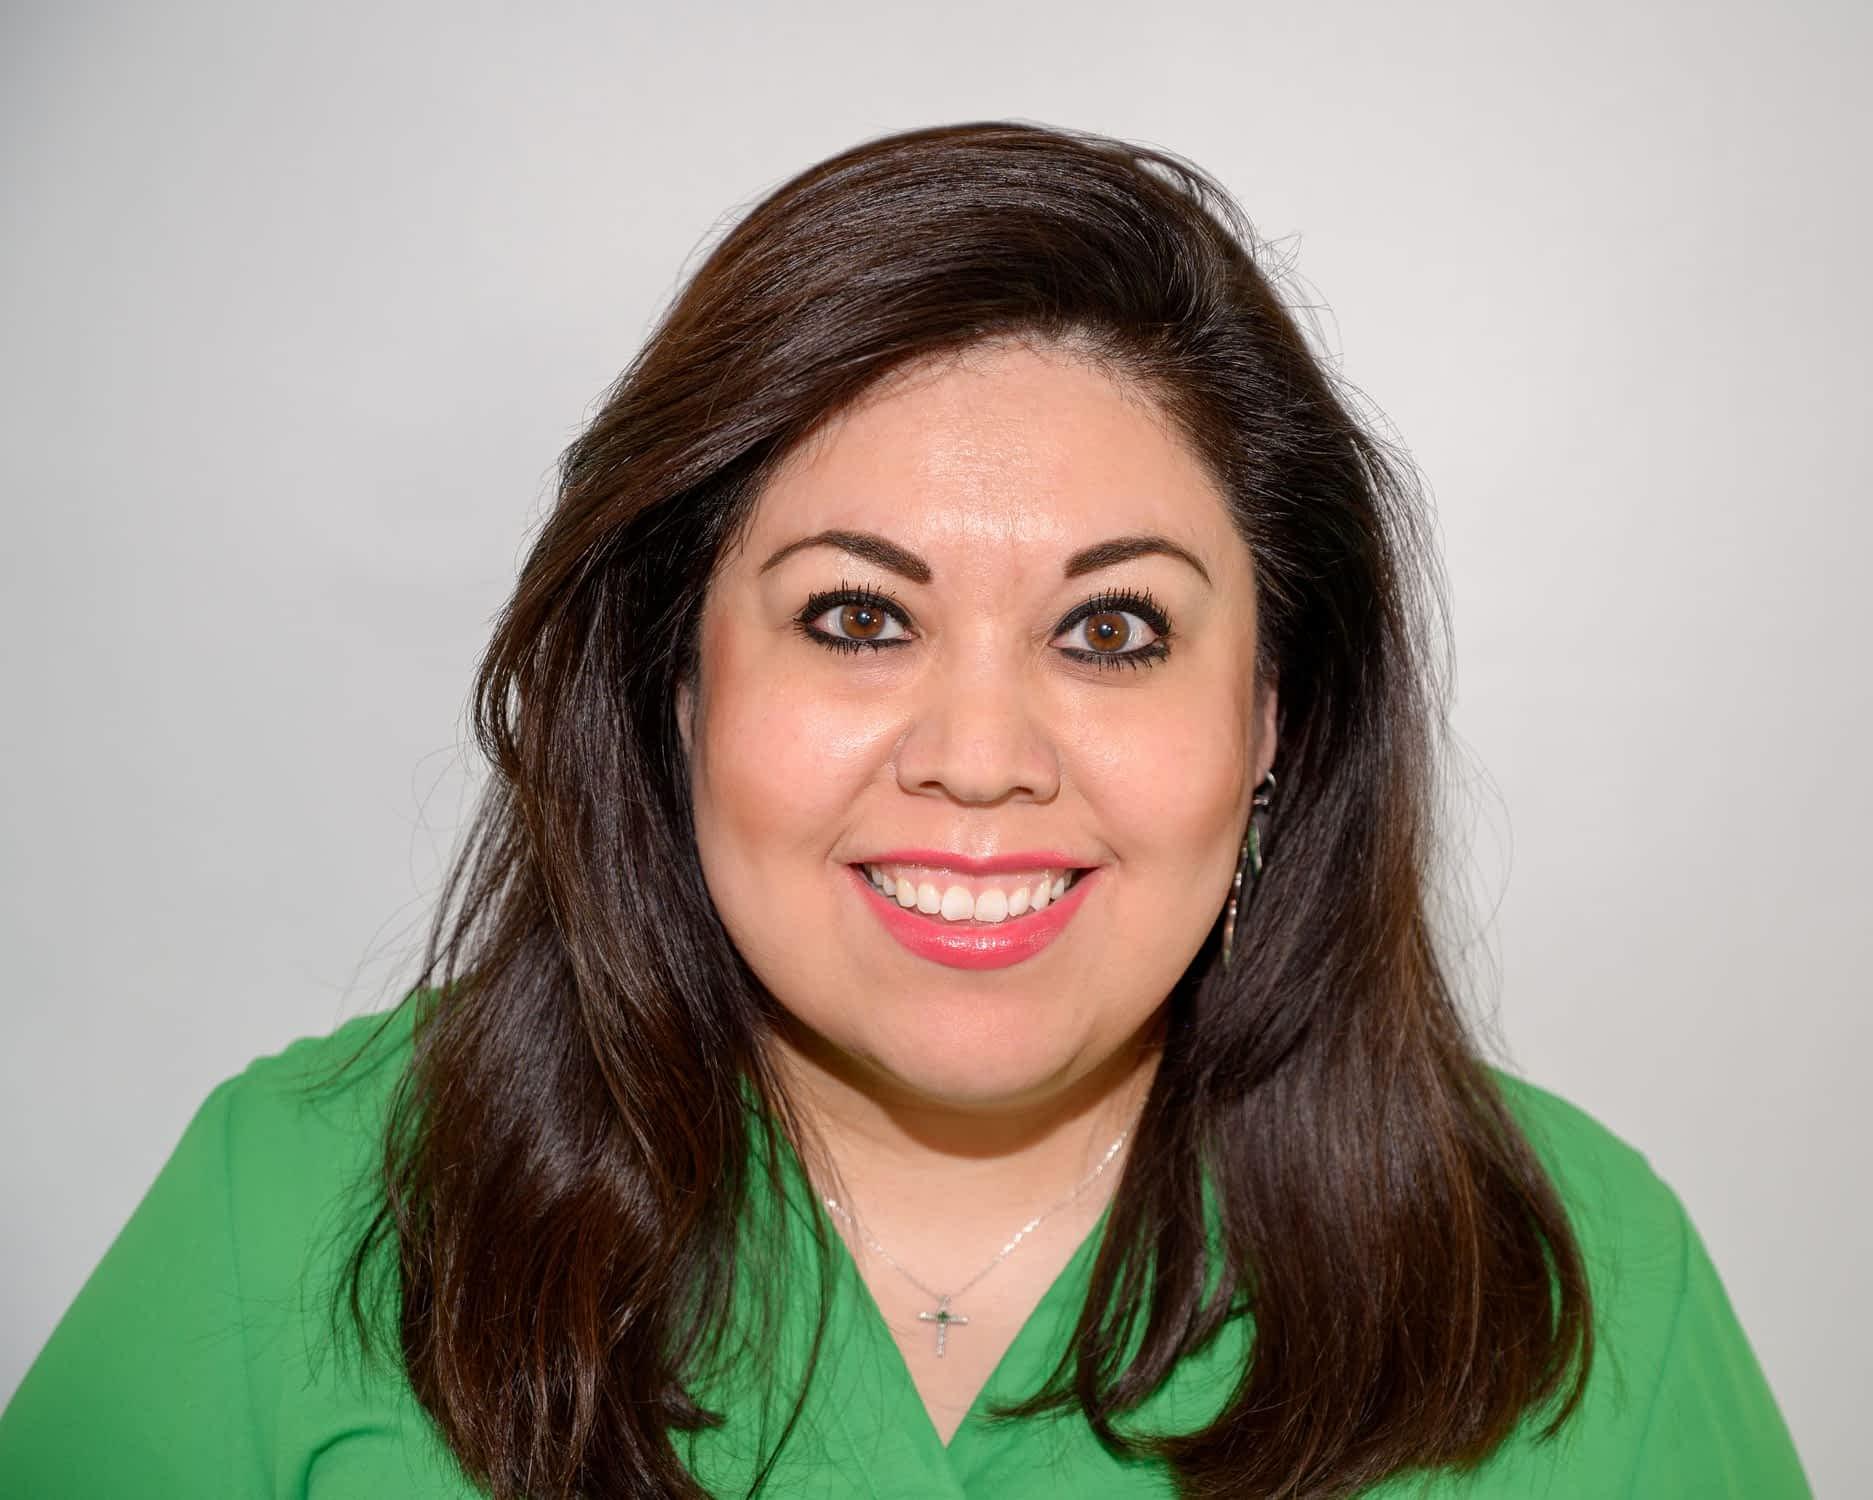 Shanelle Reyes